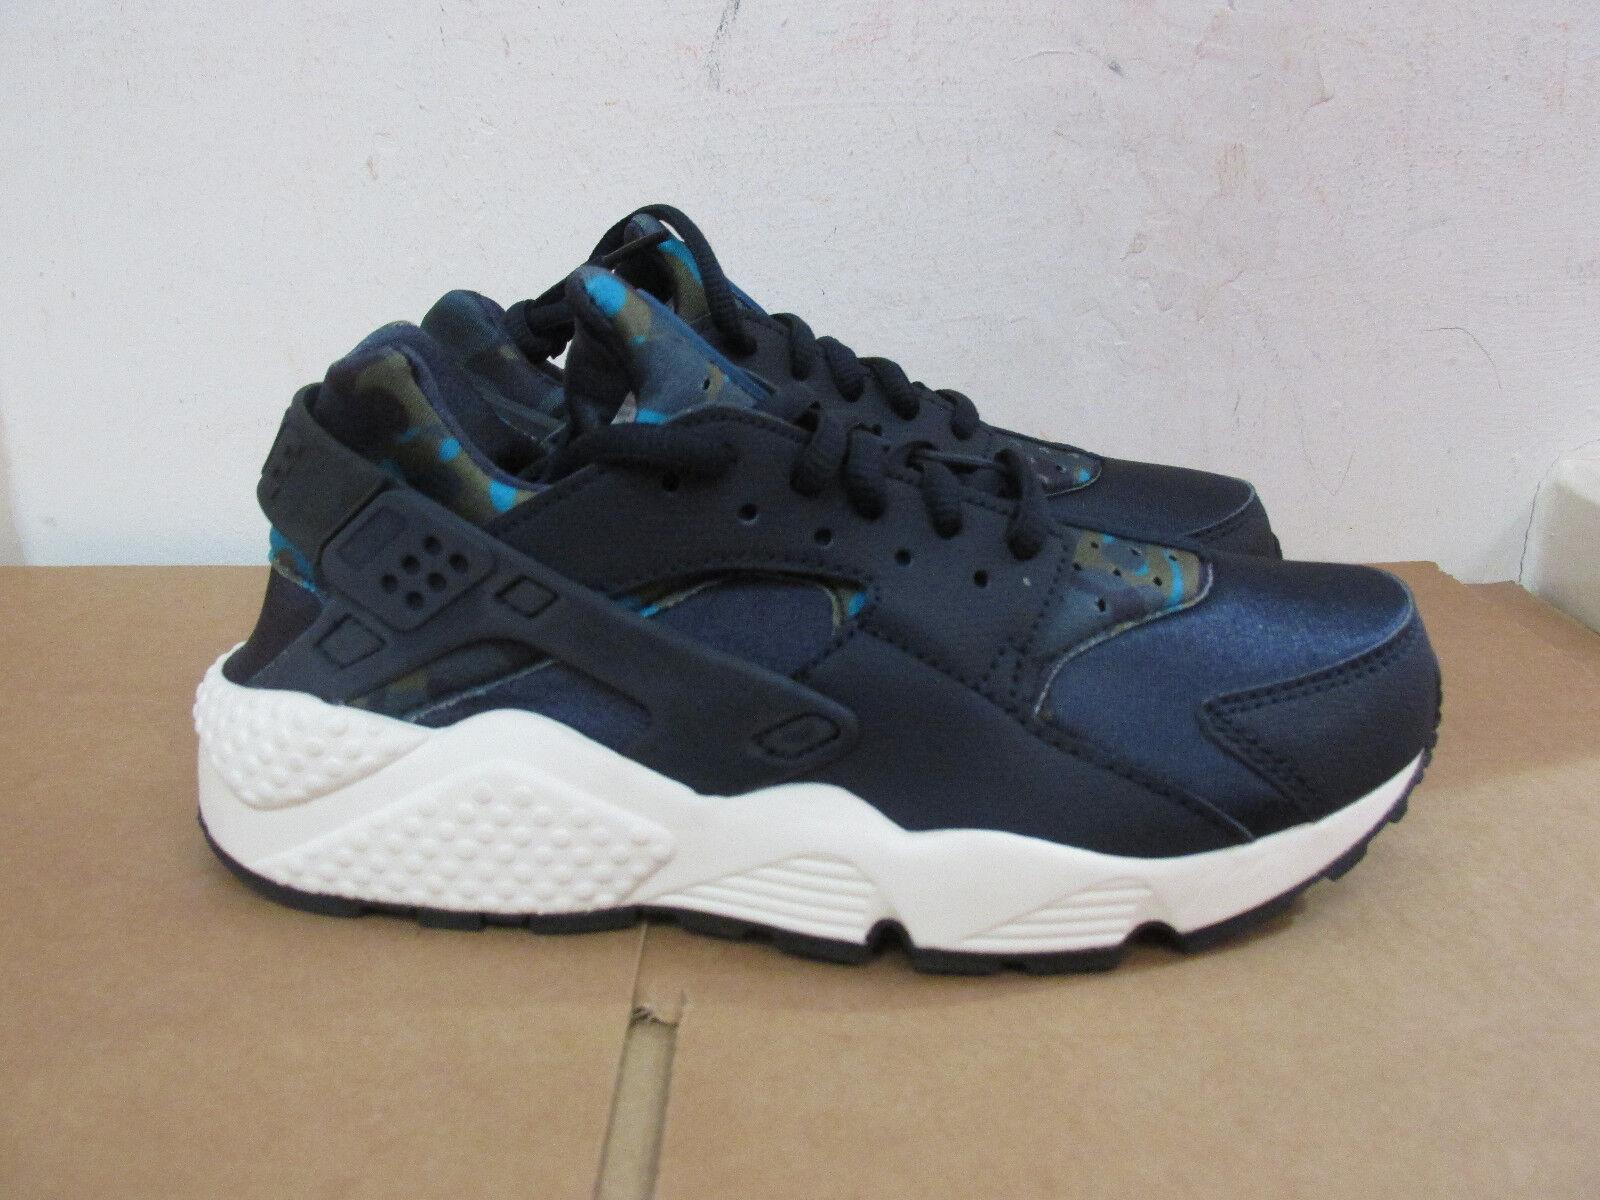 Nike Damen Huarache Druck Laufen Turnschuhe Schuhe 725076 400 Sneakers Schuhe Turnschuhe a6bae5